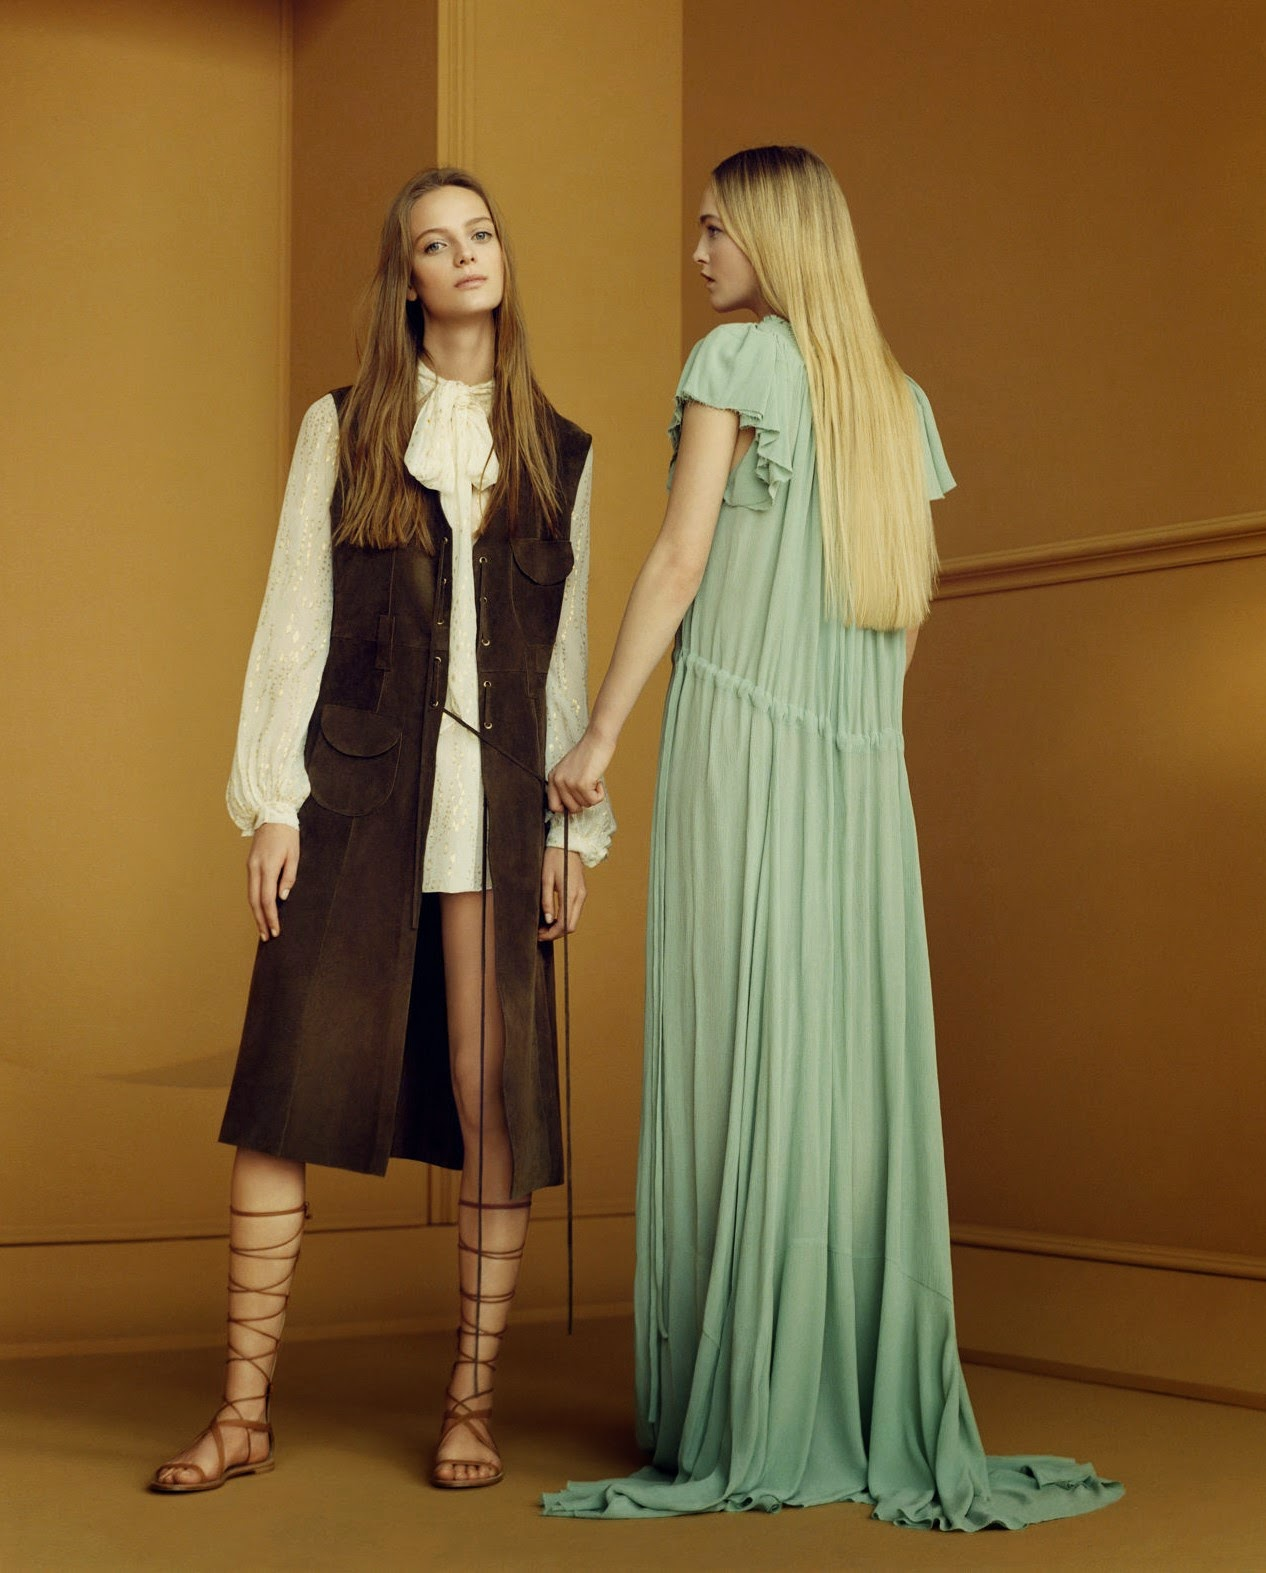 Zara Woman Fashion Campaign Sprin Summer 2015